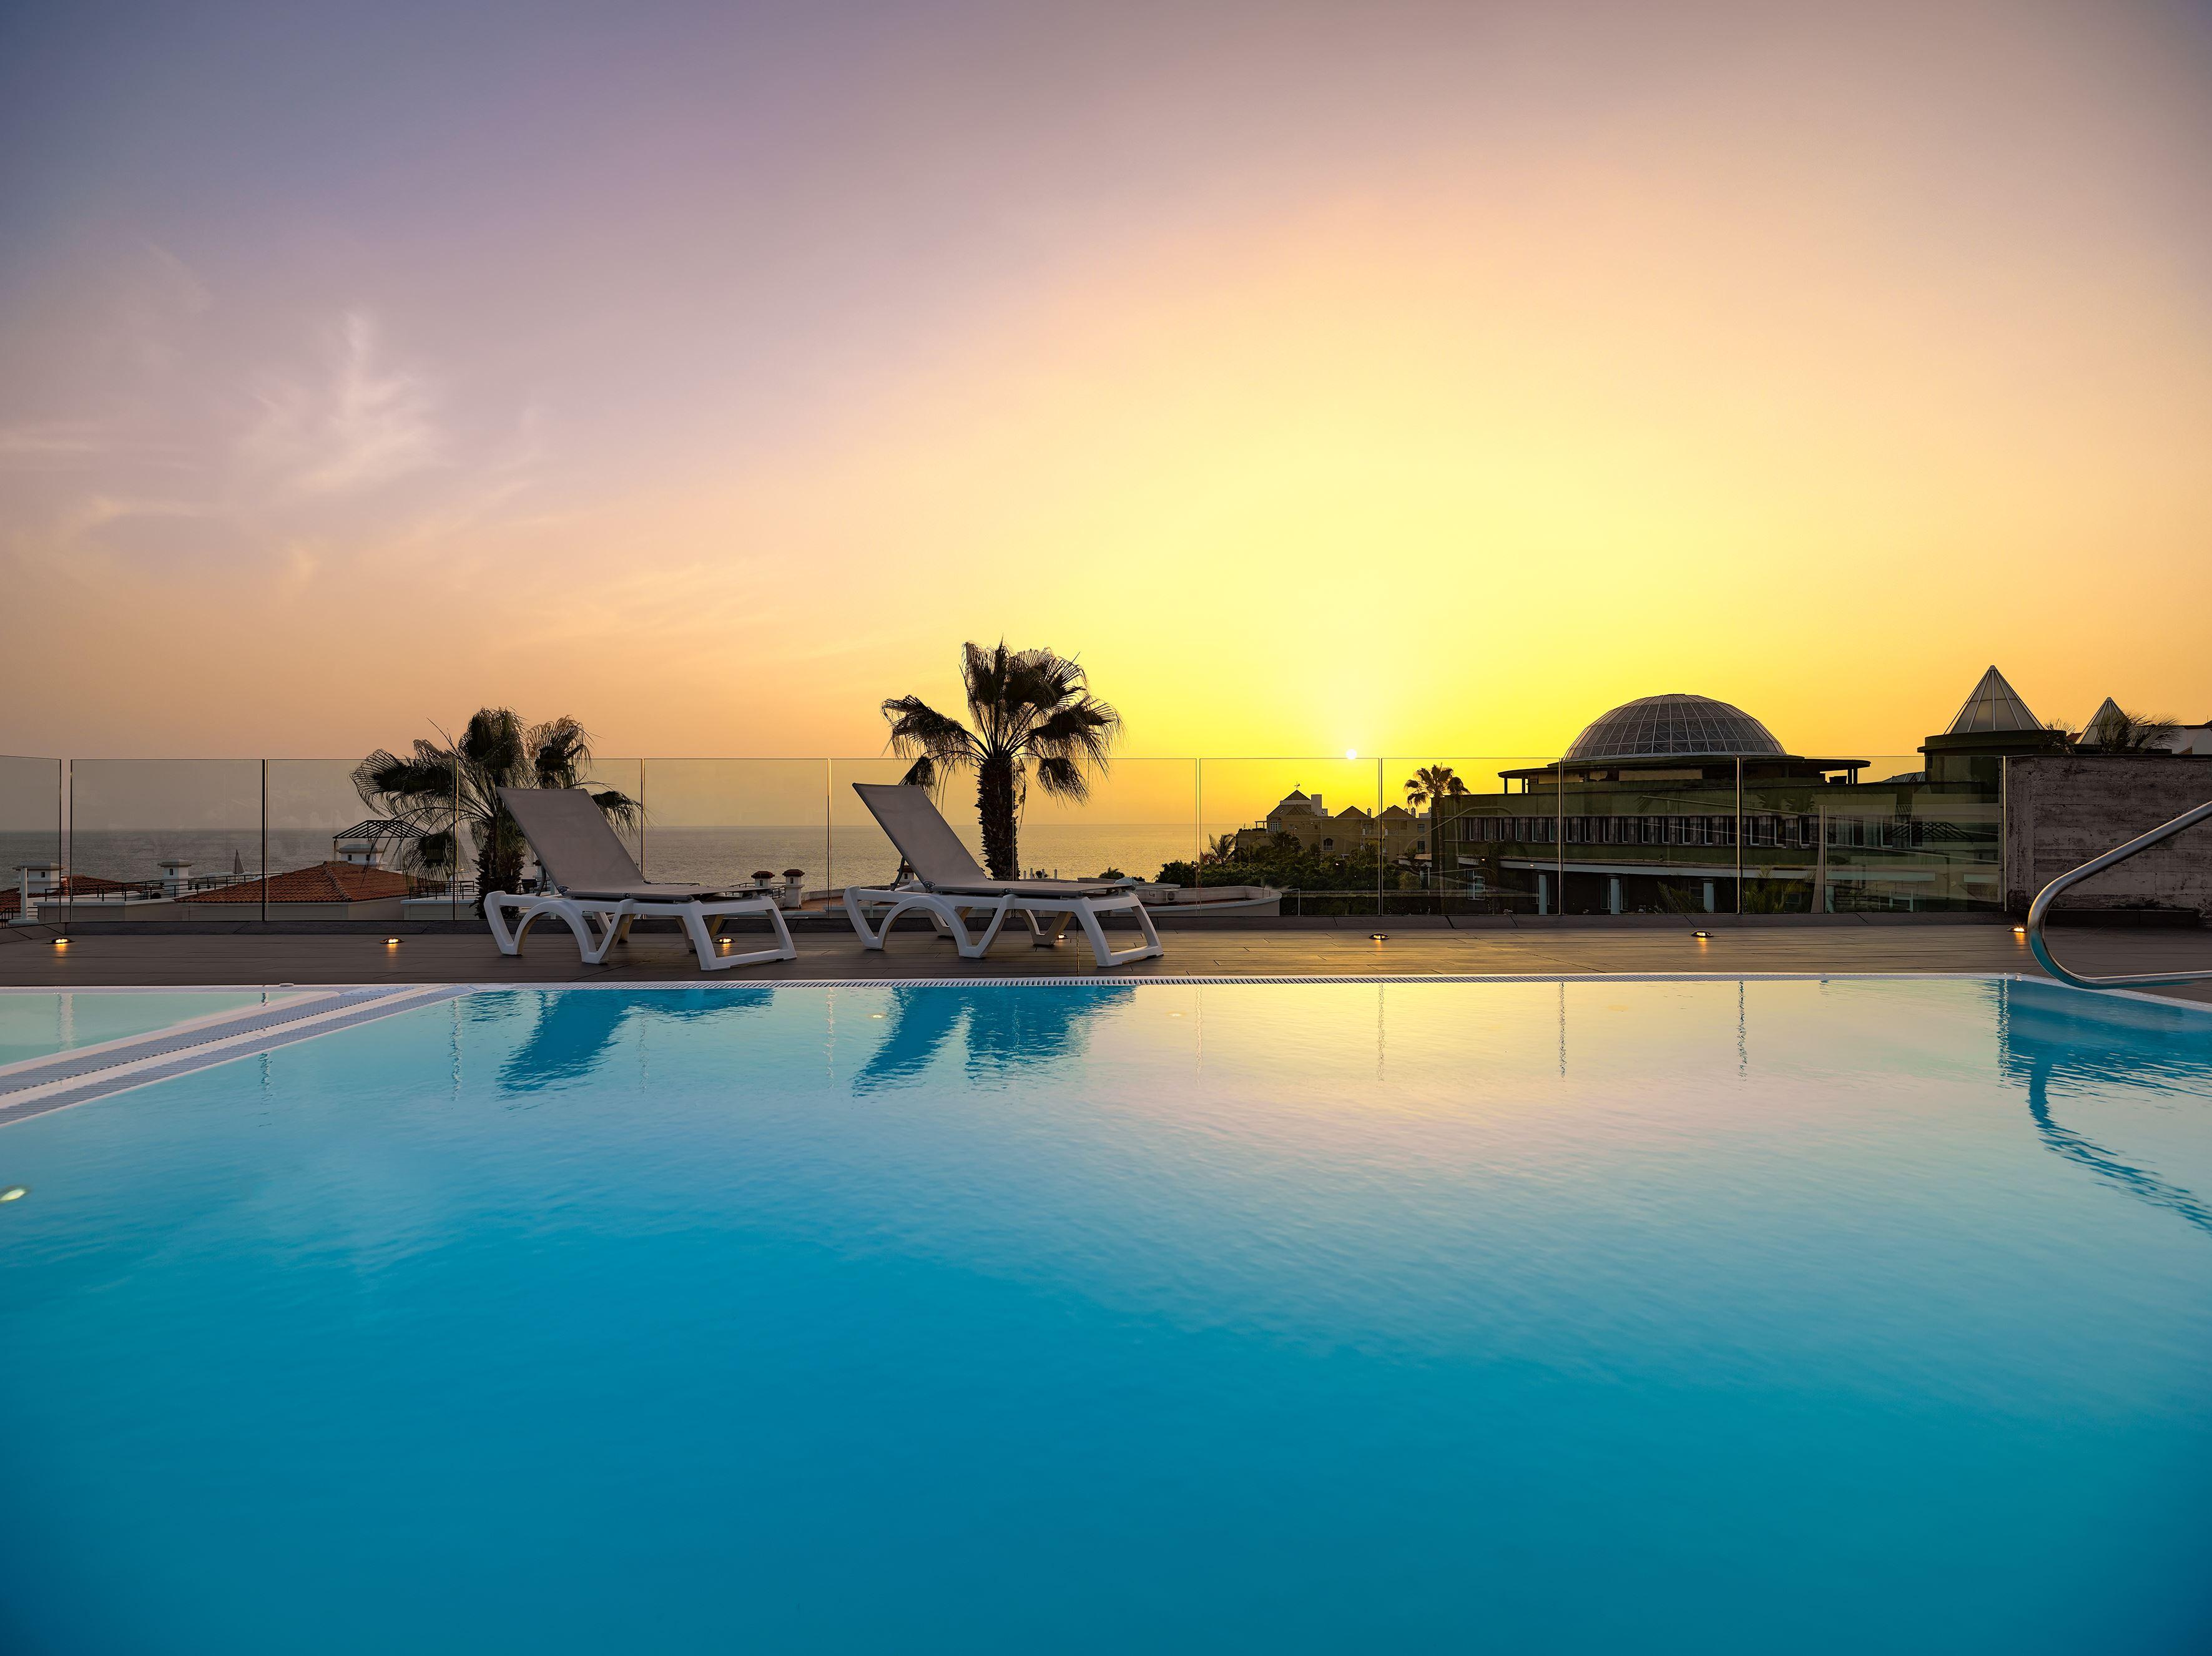 Takterass med pool Hotell Colon Guanahany, Playa de las Americas Teneriffa